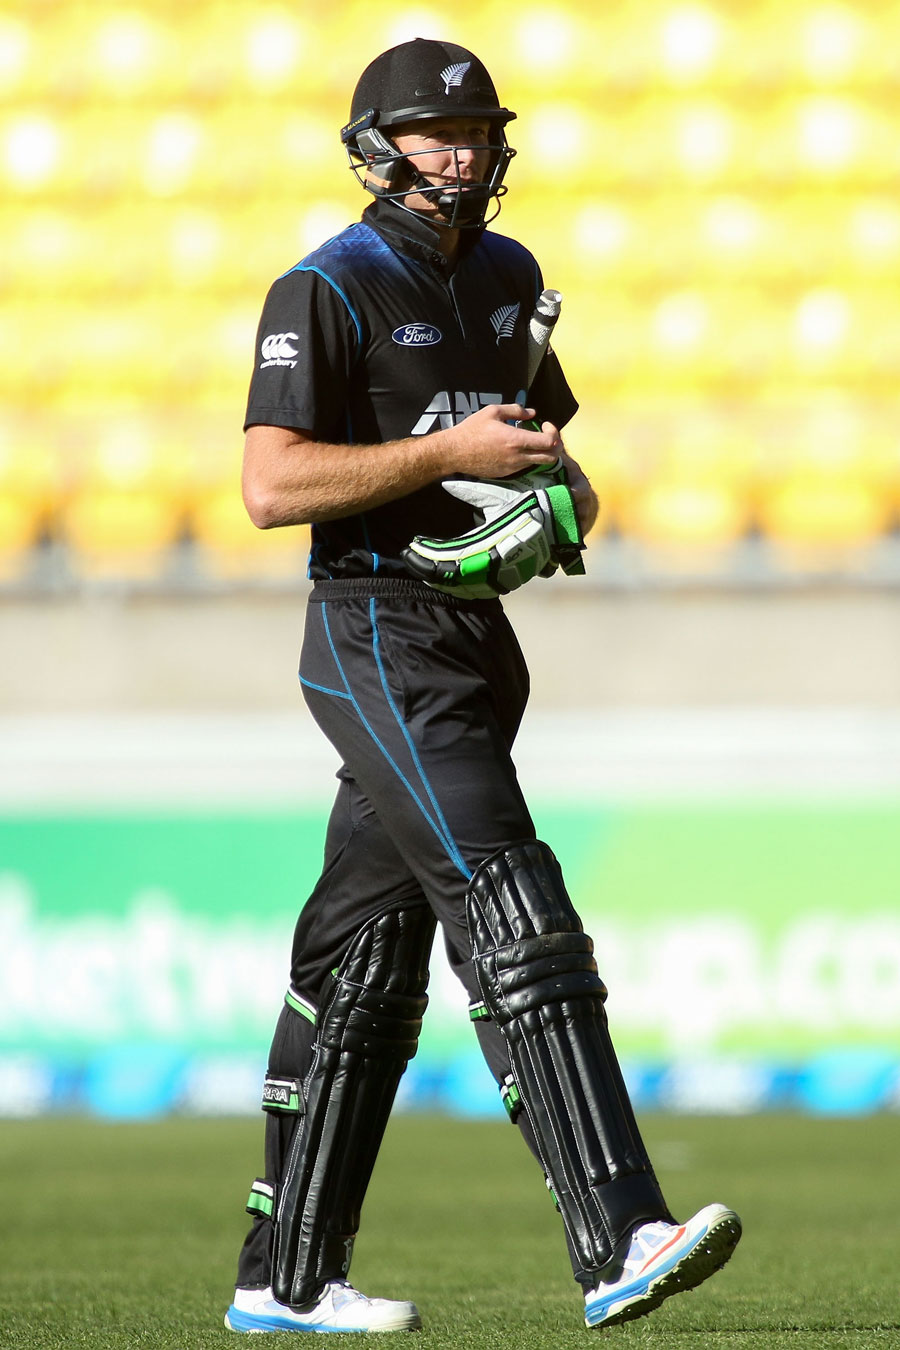 New Zealand vs Pakistan 1st ODI